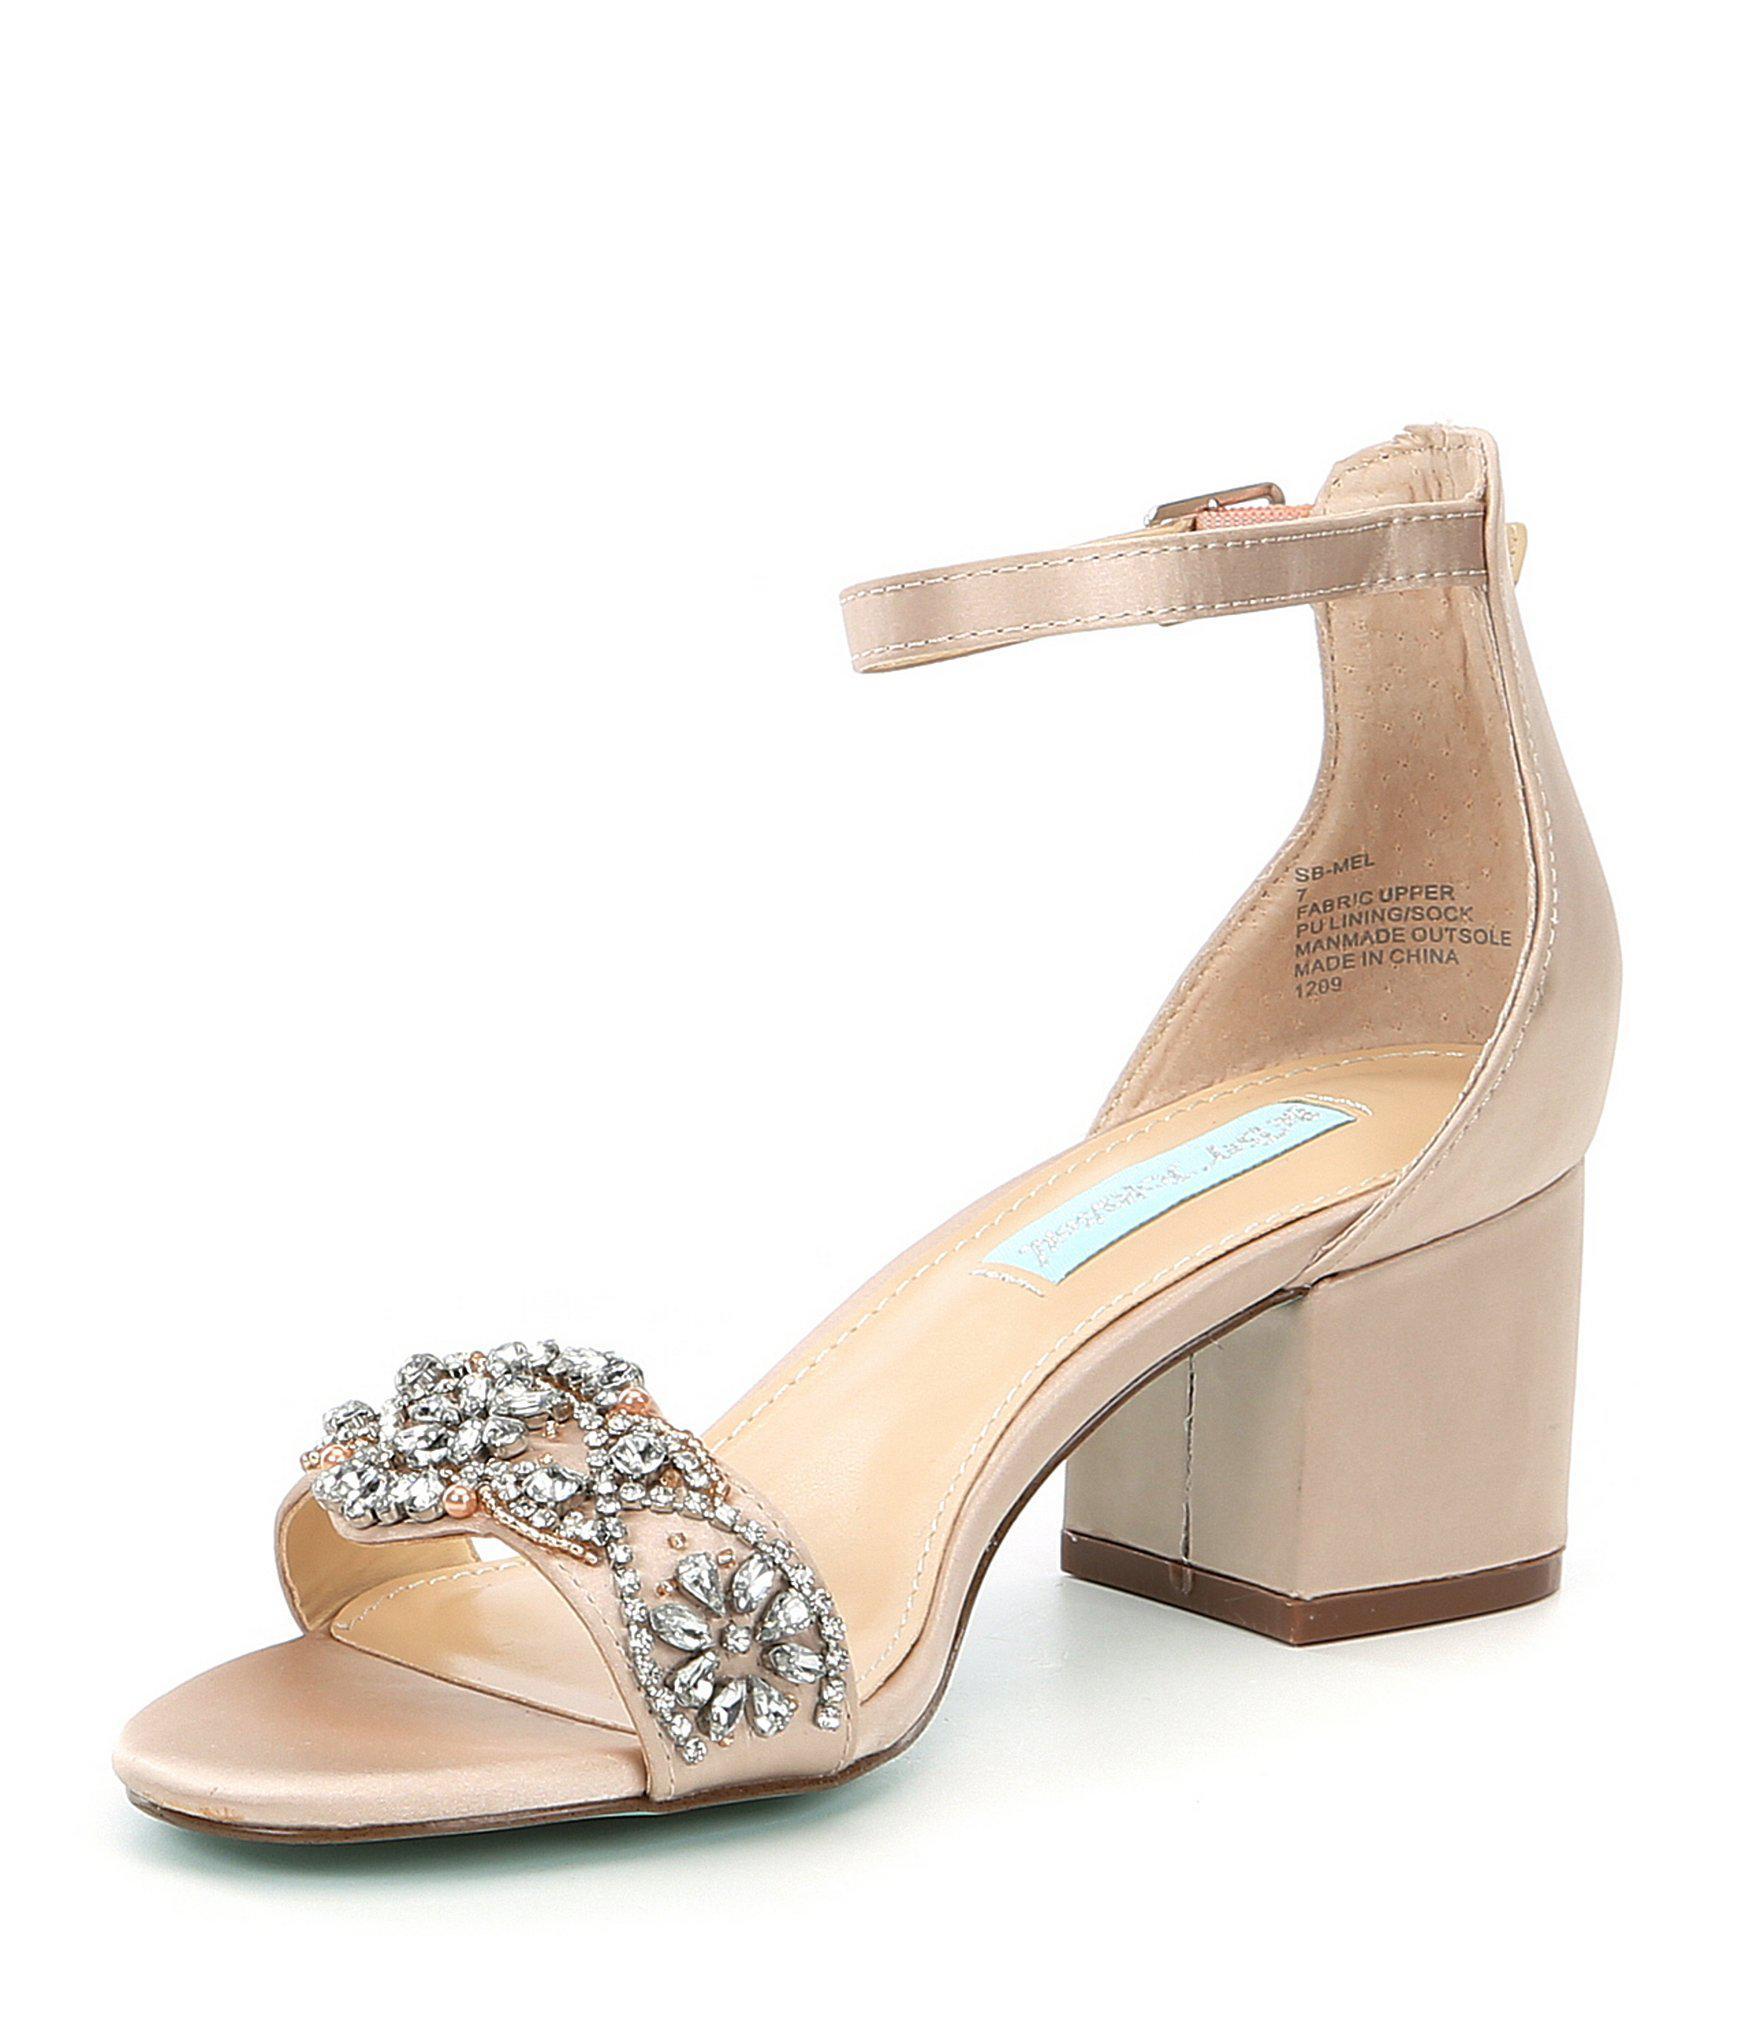 4bdd56b0ab Betsey Johnson Blue By Mel Bejeweled Satin Block Heel Dress Sandals ...